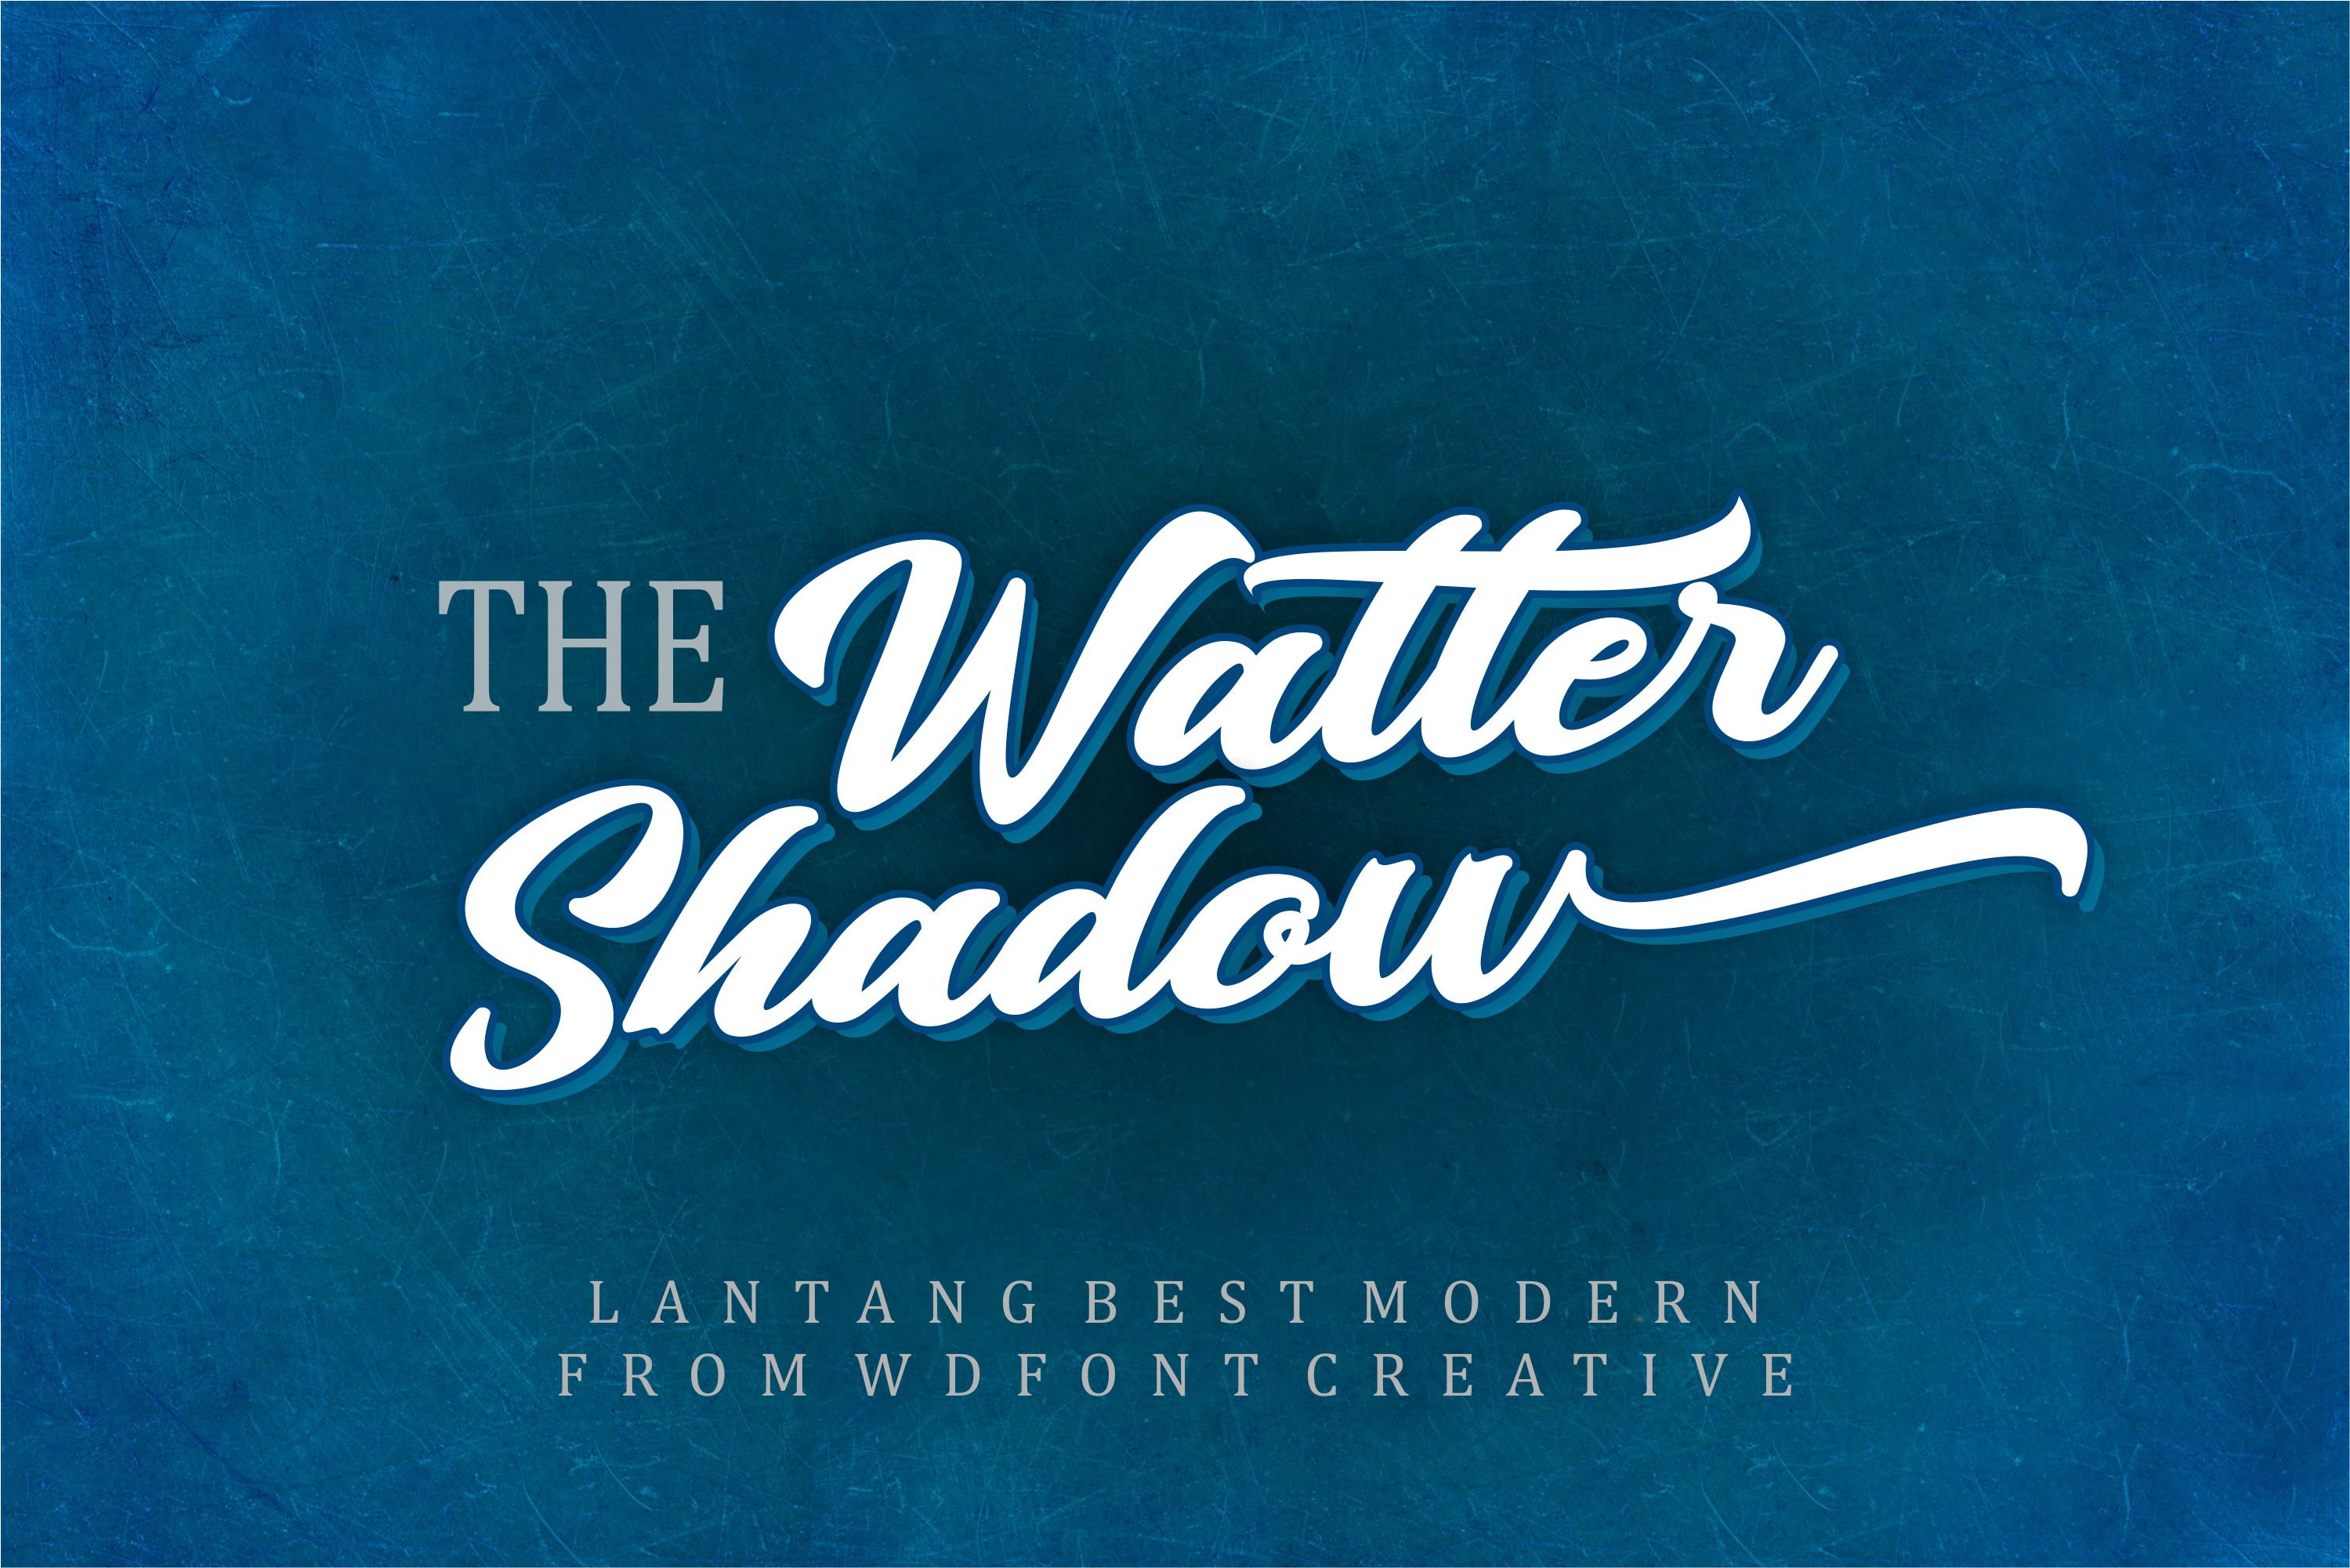 Lantang Best | Modern Stylish Font example image 3